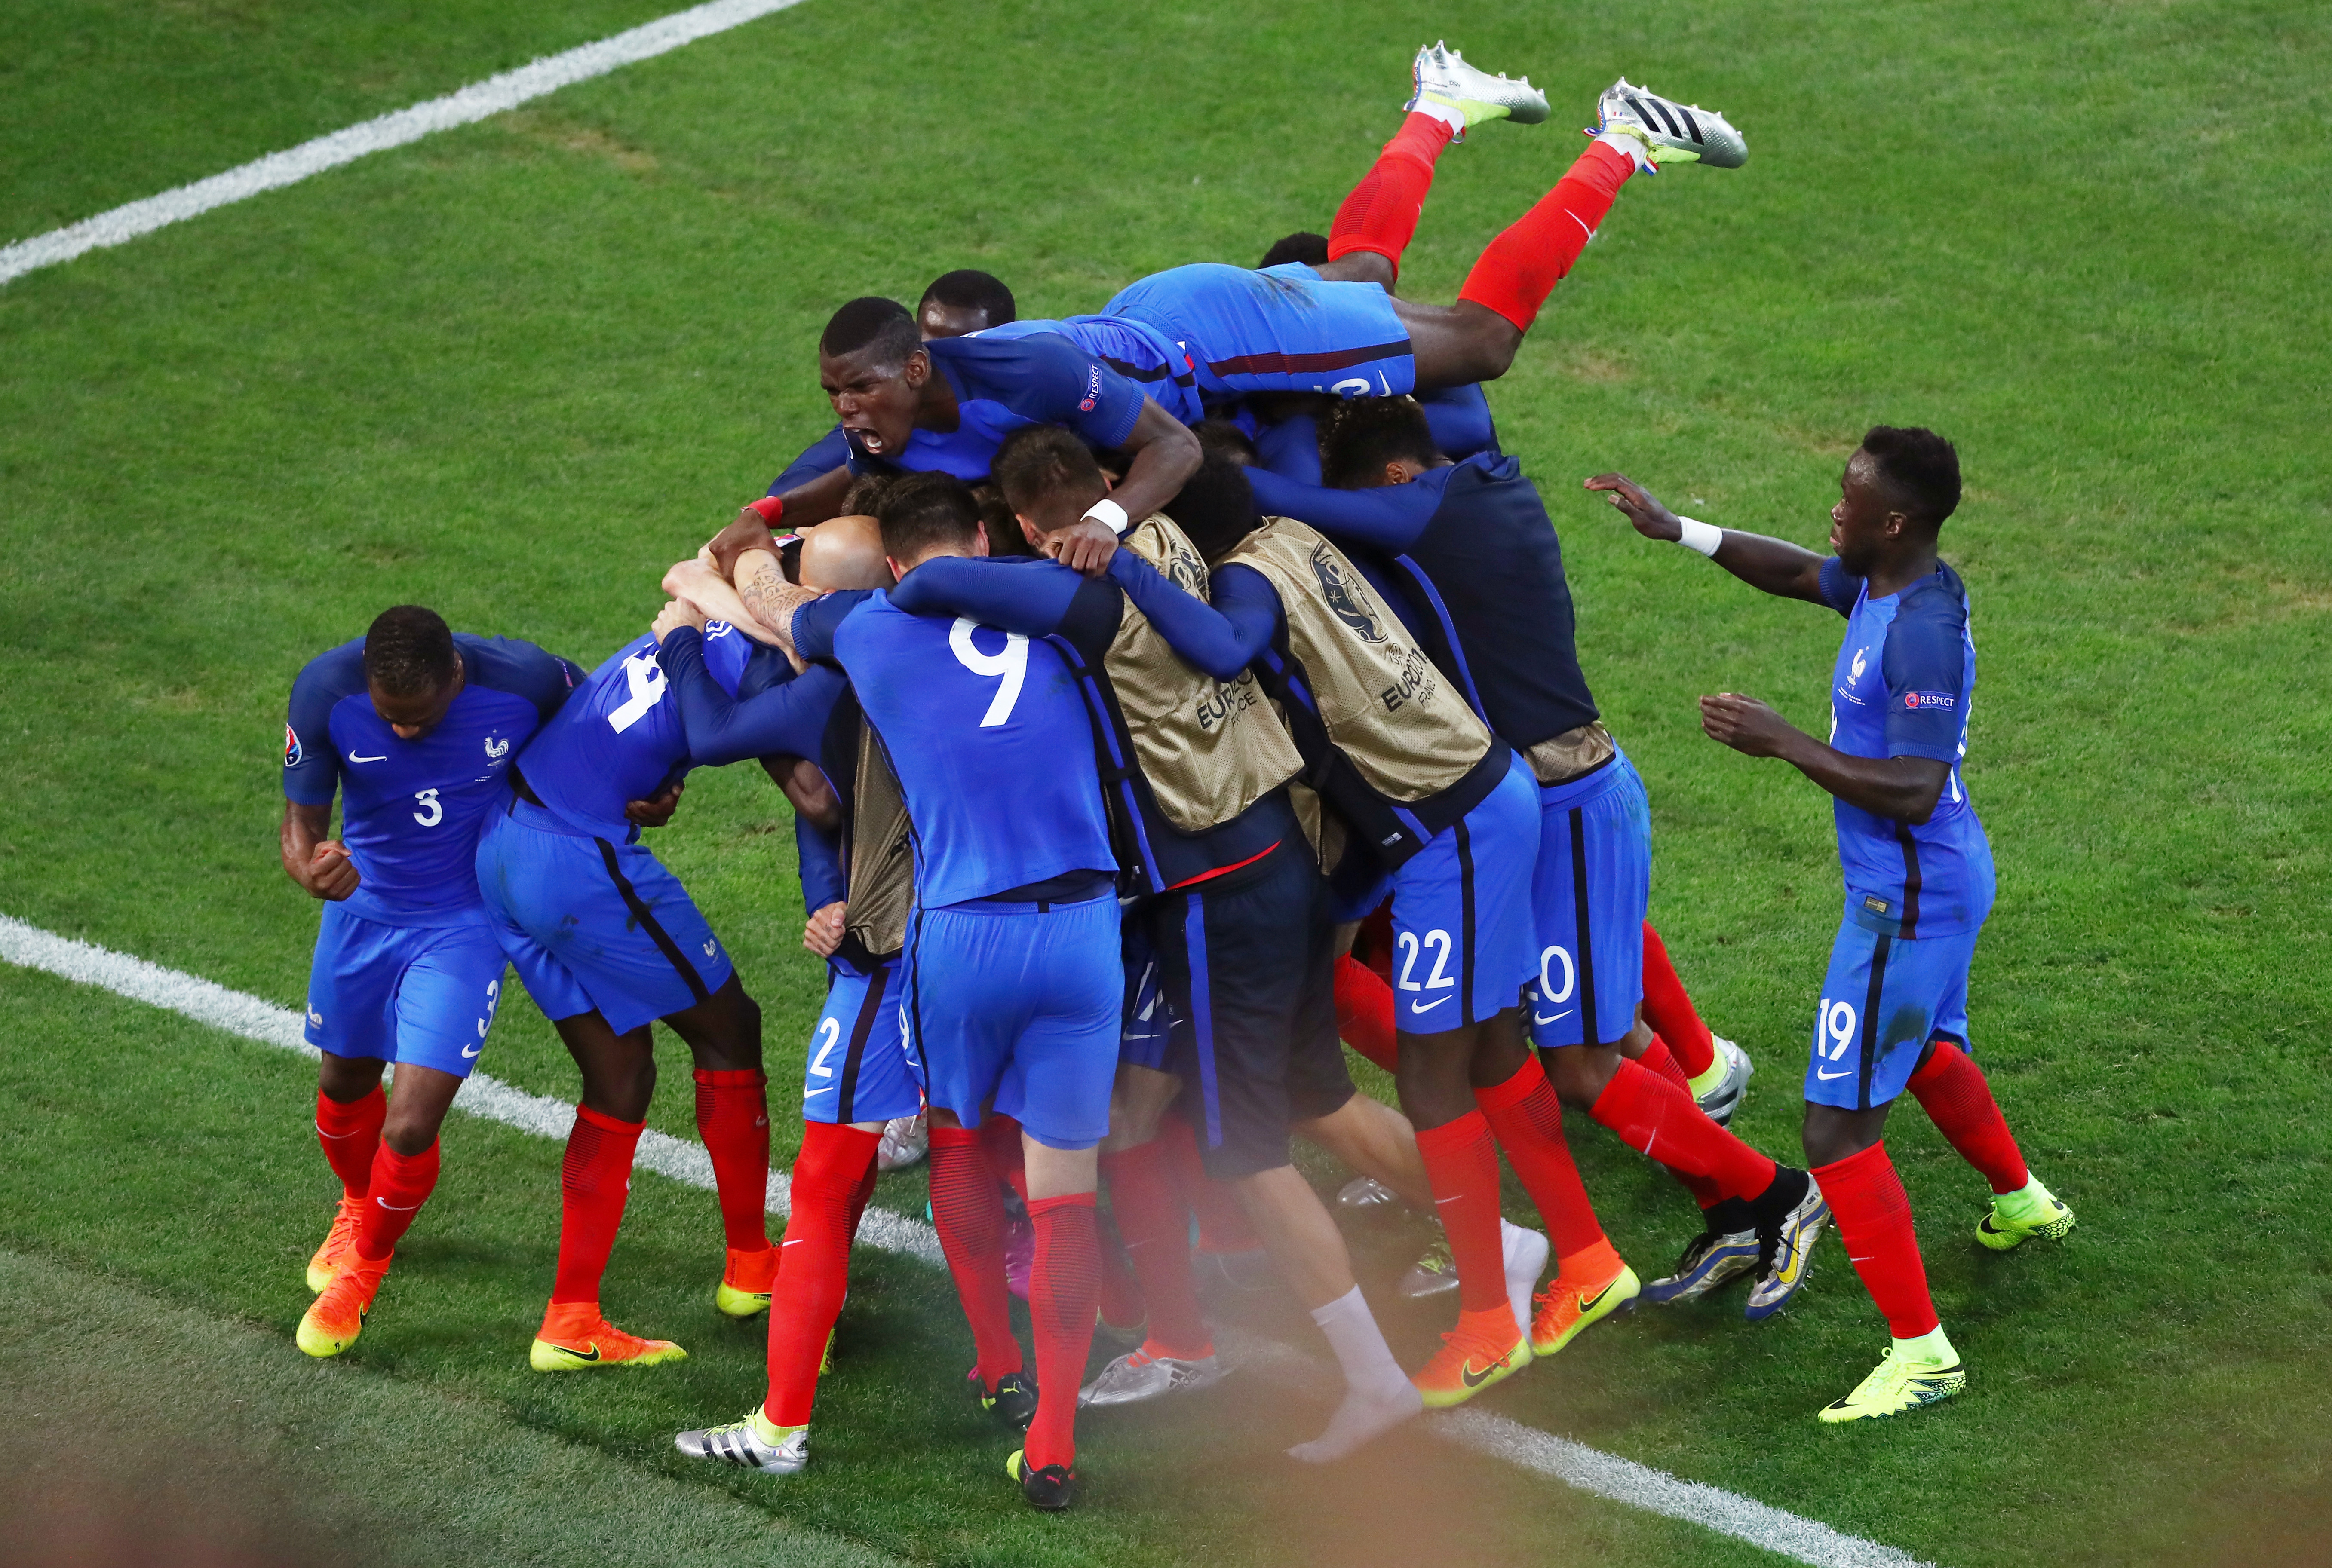 Calcio, Europei 2016: Griezmann salva la Francia, Irlanda ko in rimonta